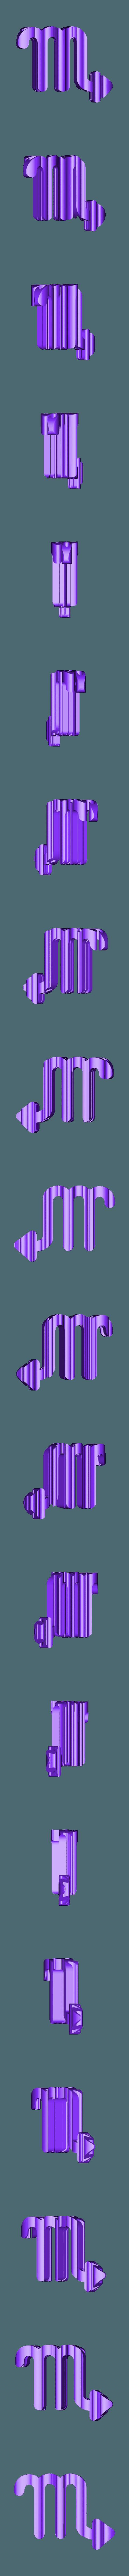 scorpion.stl Download STL file Text Flip, Scorpion • Design to 3D print, mr_printer_bot